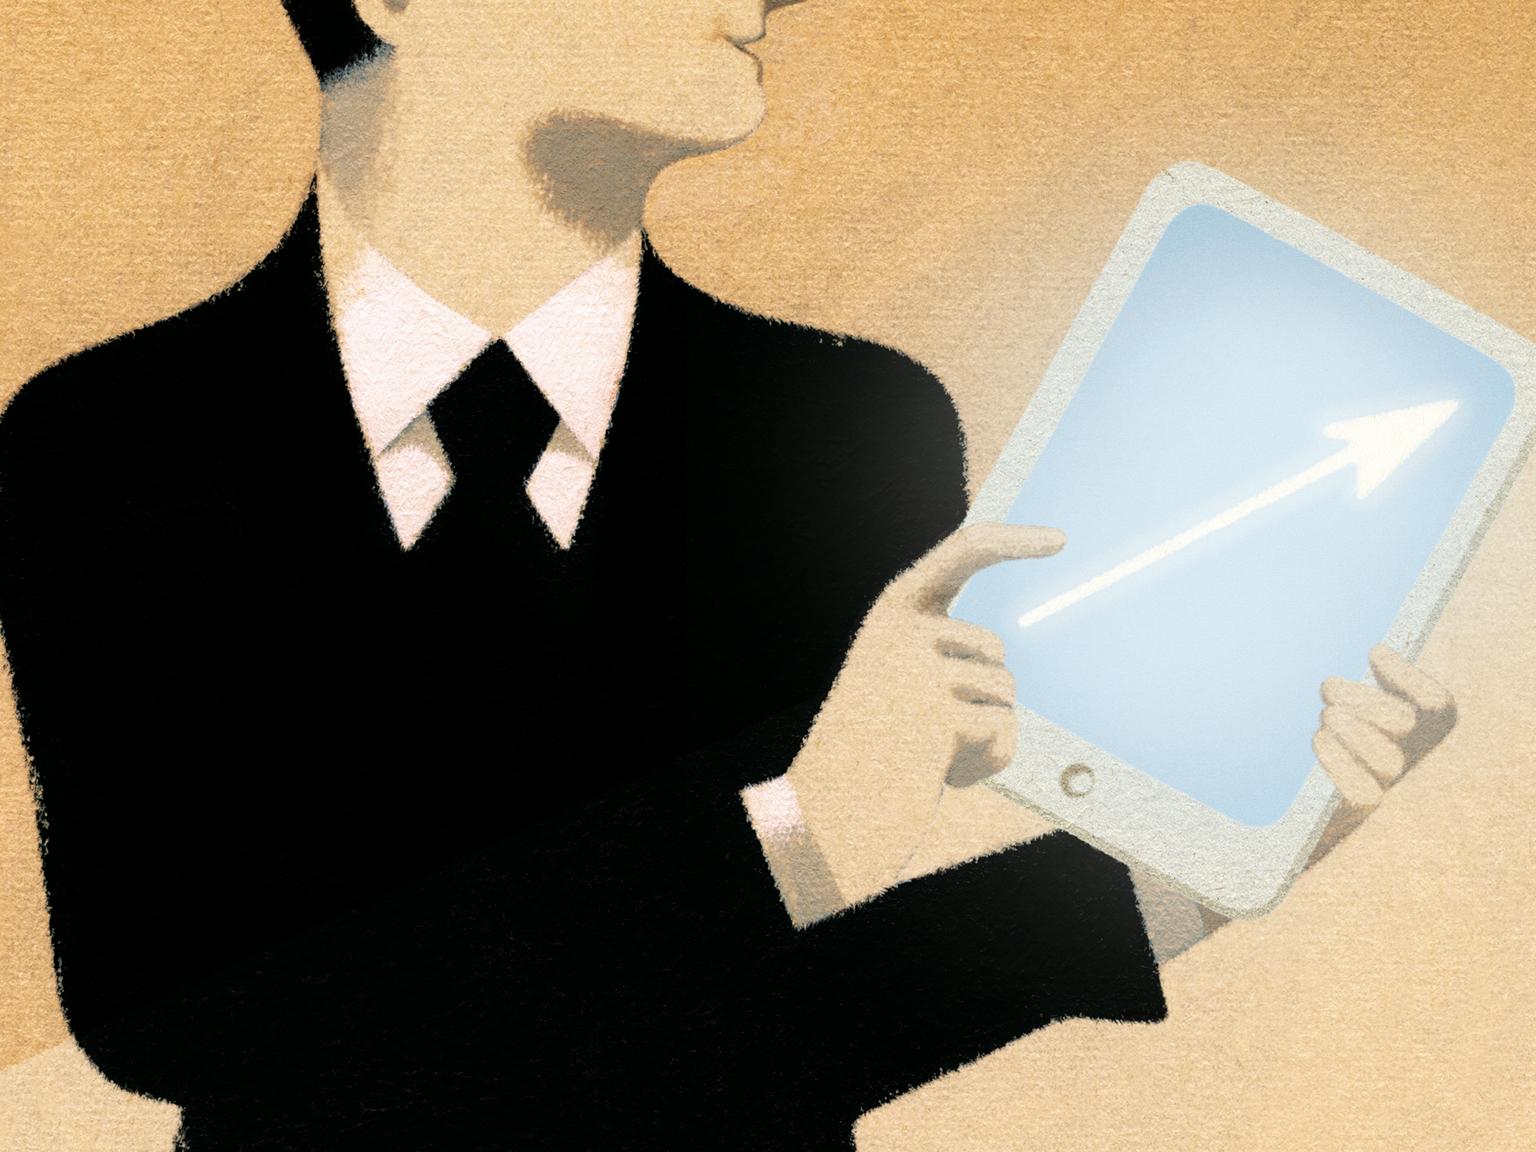 Bullish on digital: McKinsey Global Survey results